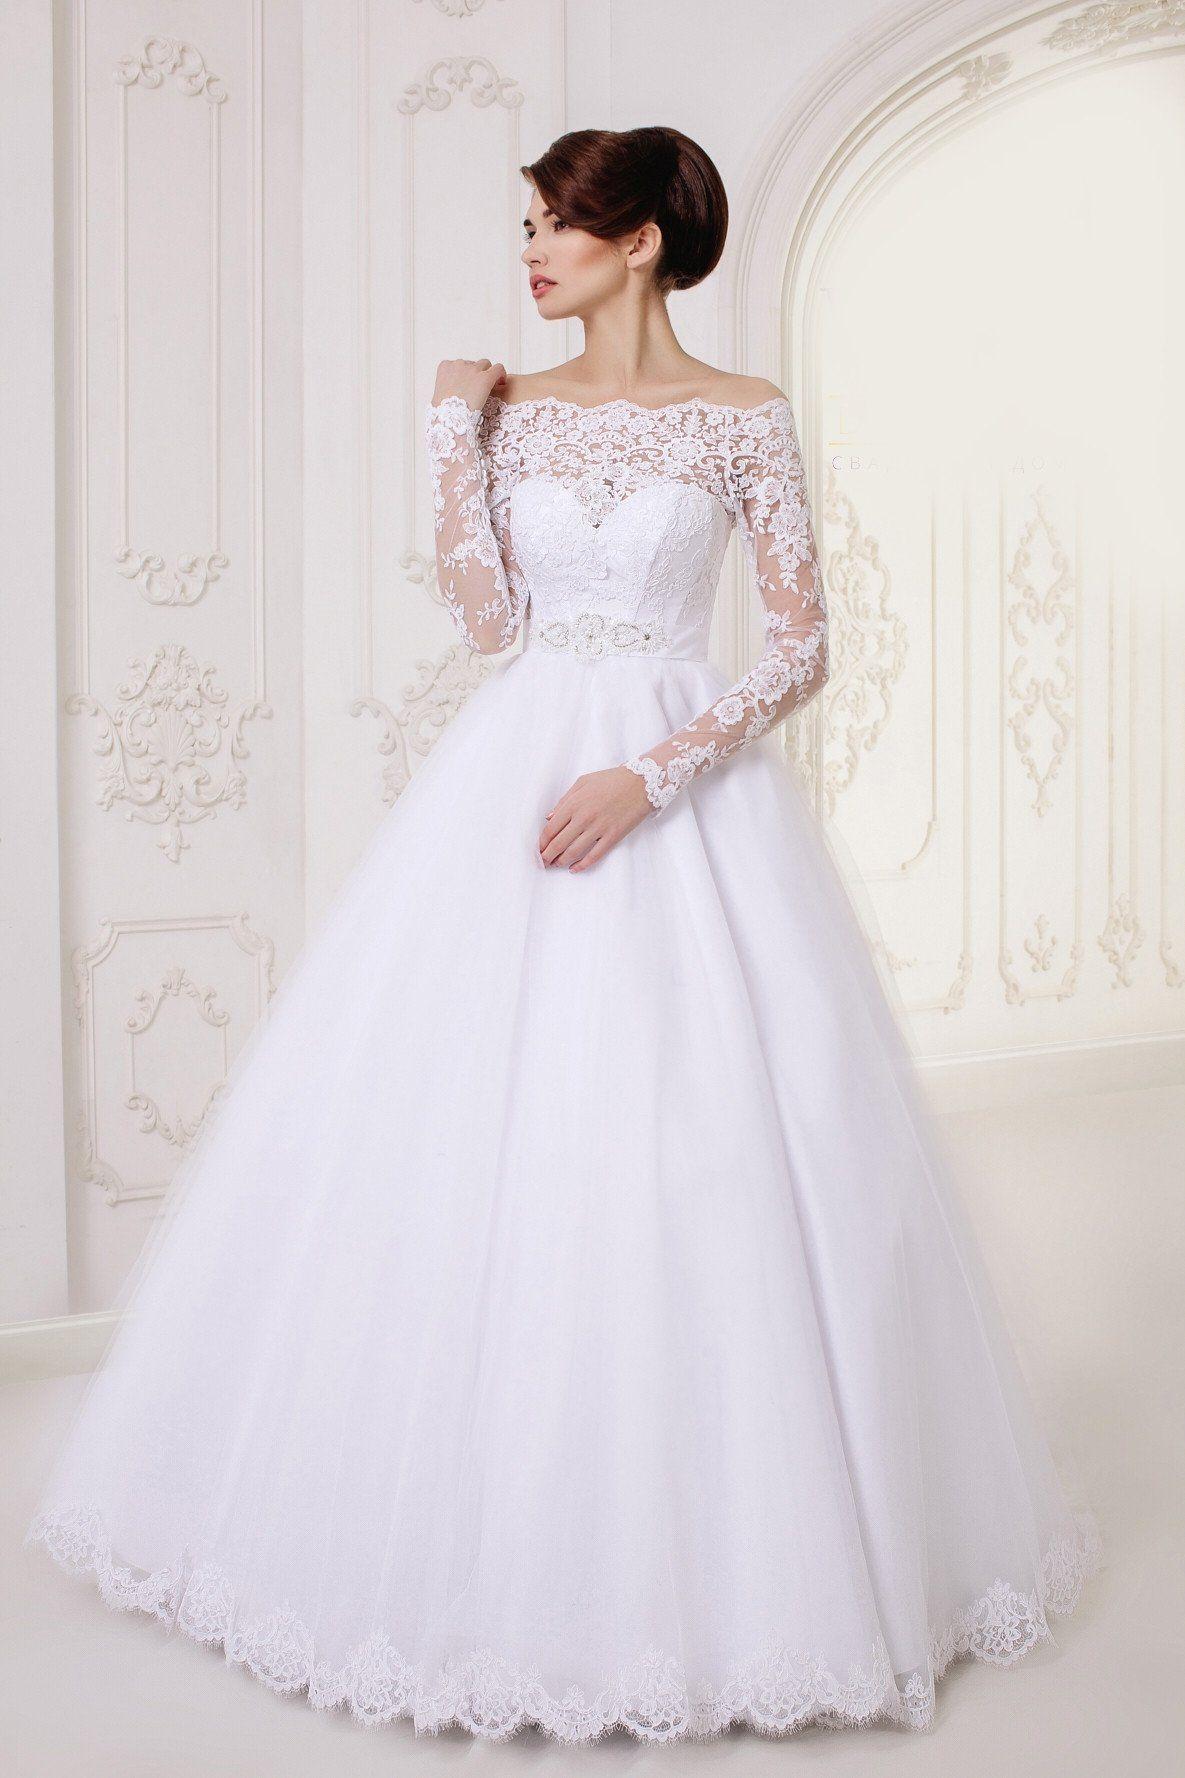 Dresses Long Aline Lace Sleeves Wedding Dress S White My Best 1: S Lace Long Wedding Dresses At Reisefeber.org